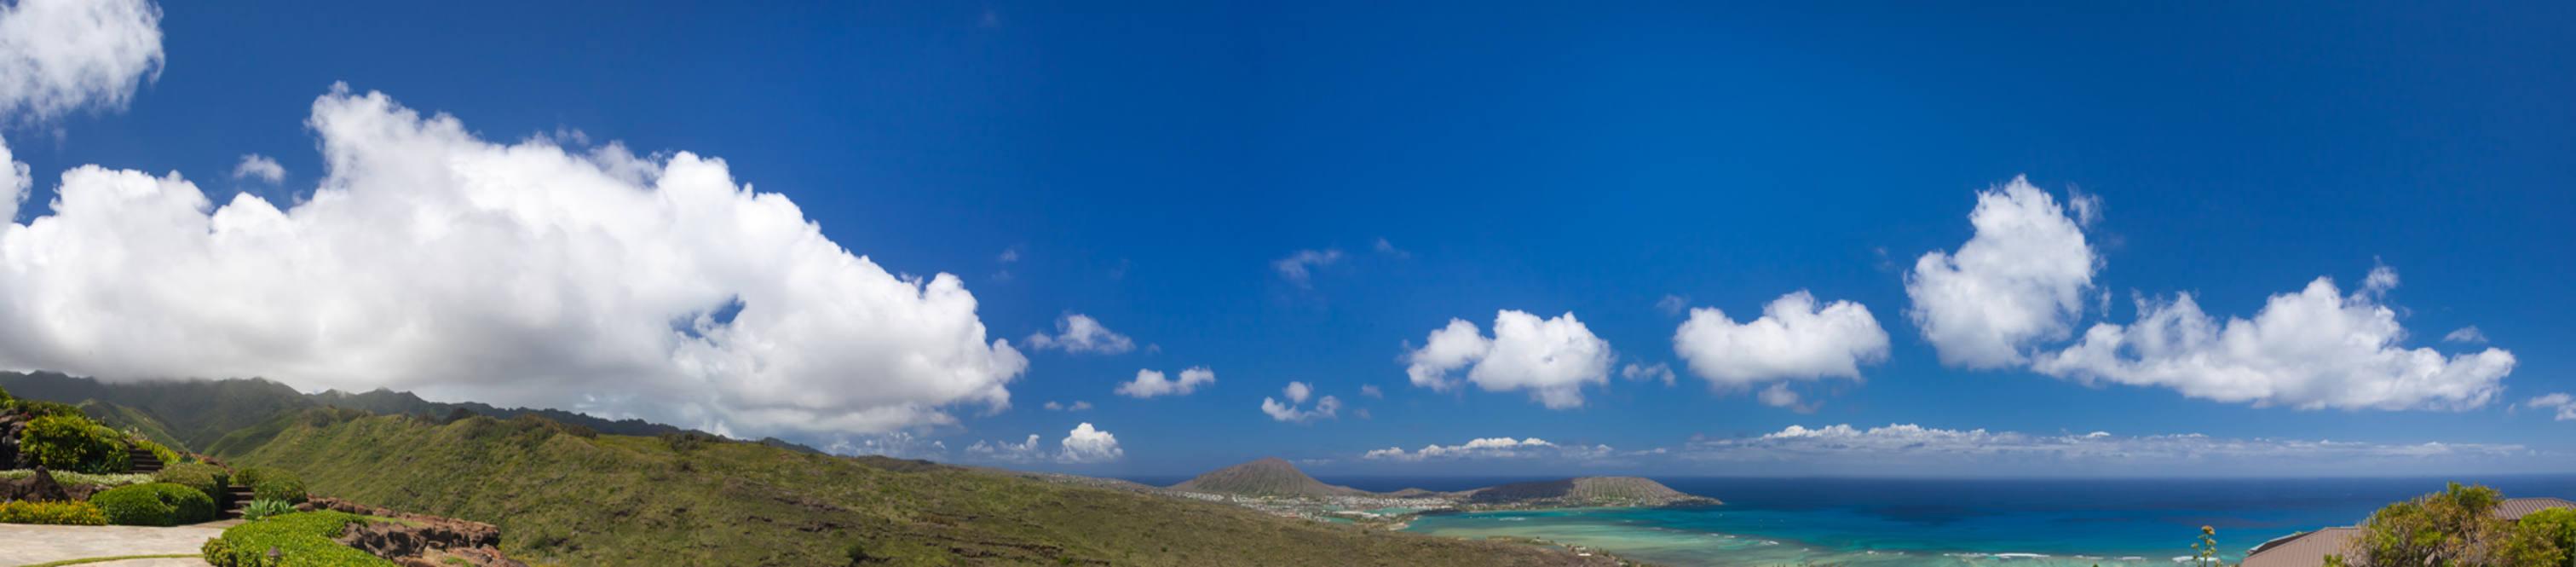 28. panoramic view of mountains  kokohd   ocean 828 moaniala street